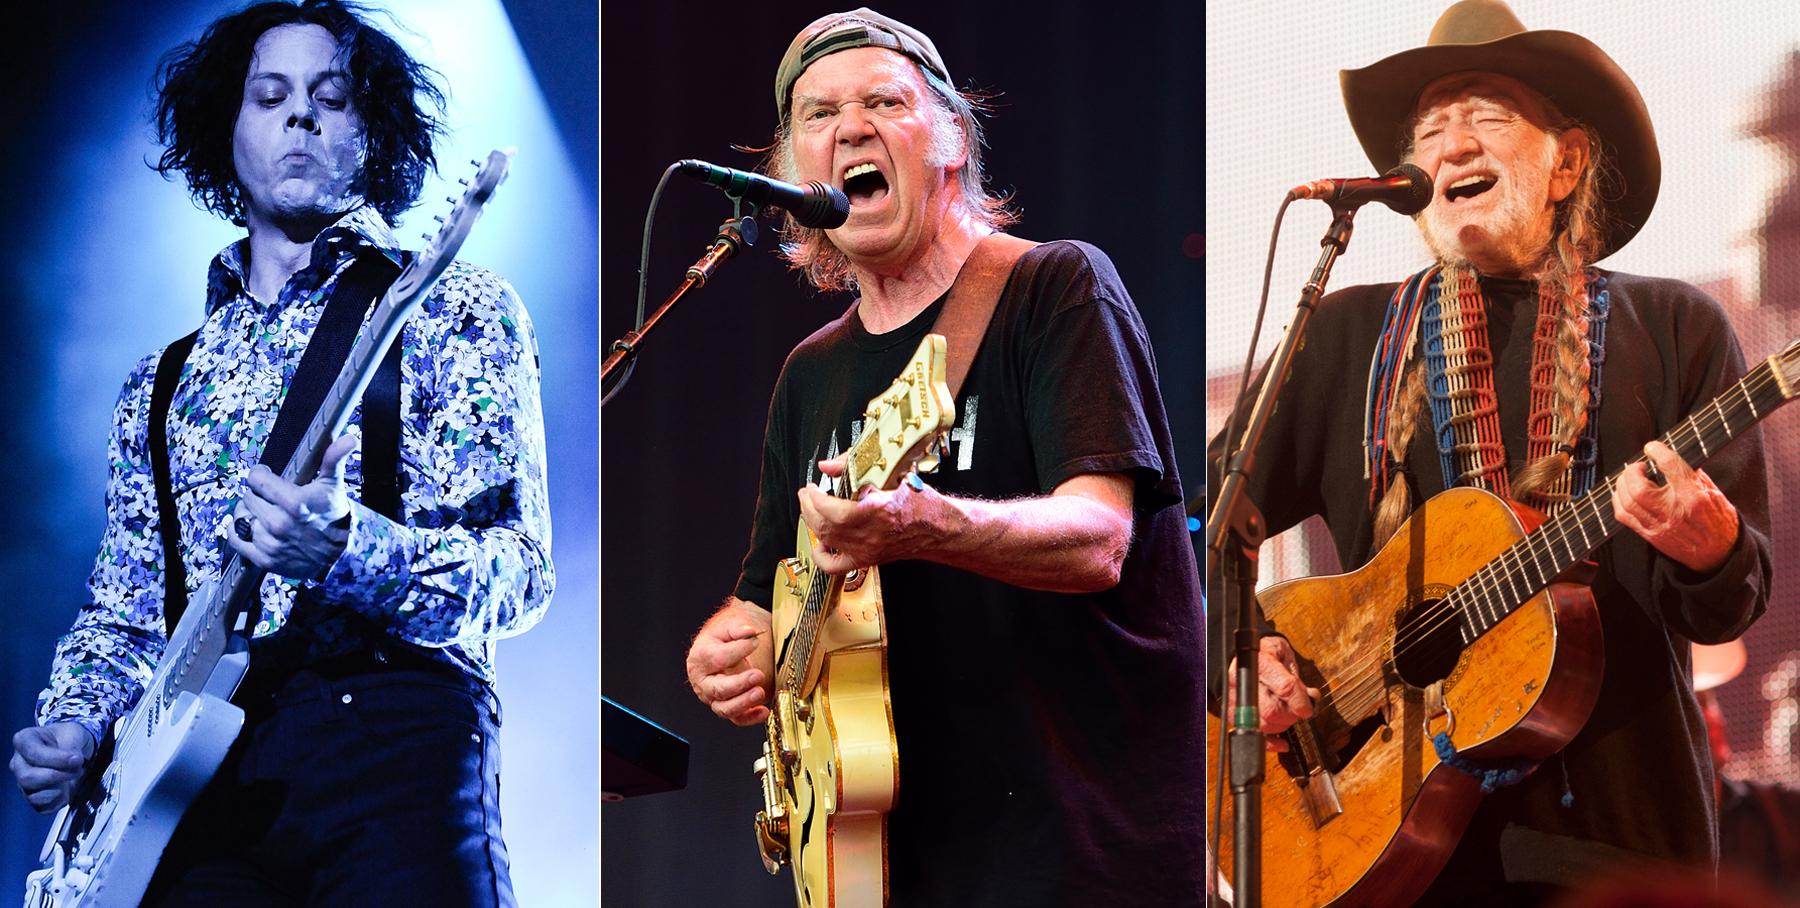 Jack White, Neil Young, Willie Nelson to Headline Farm Aid